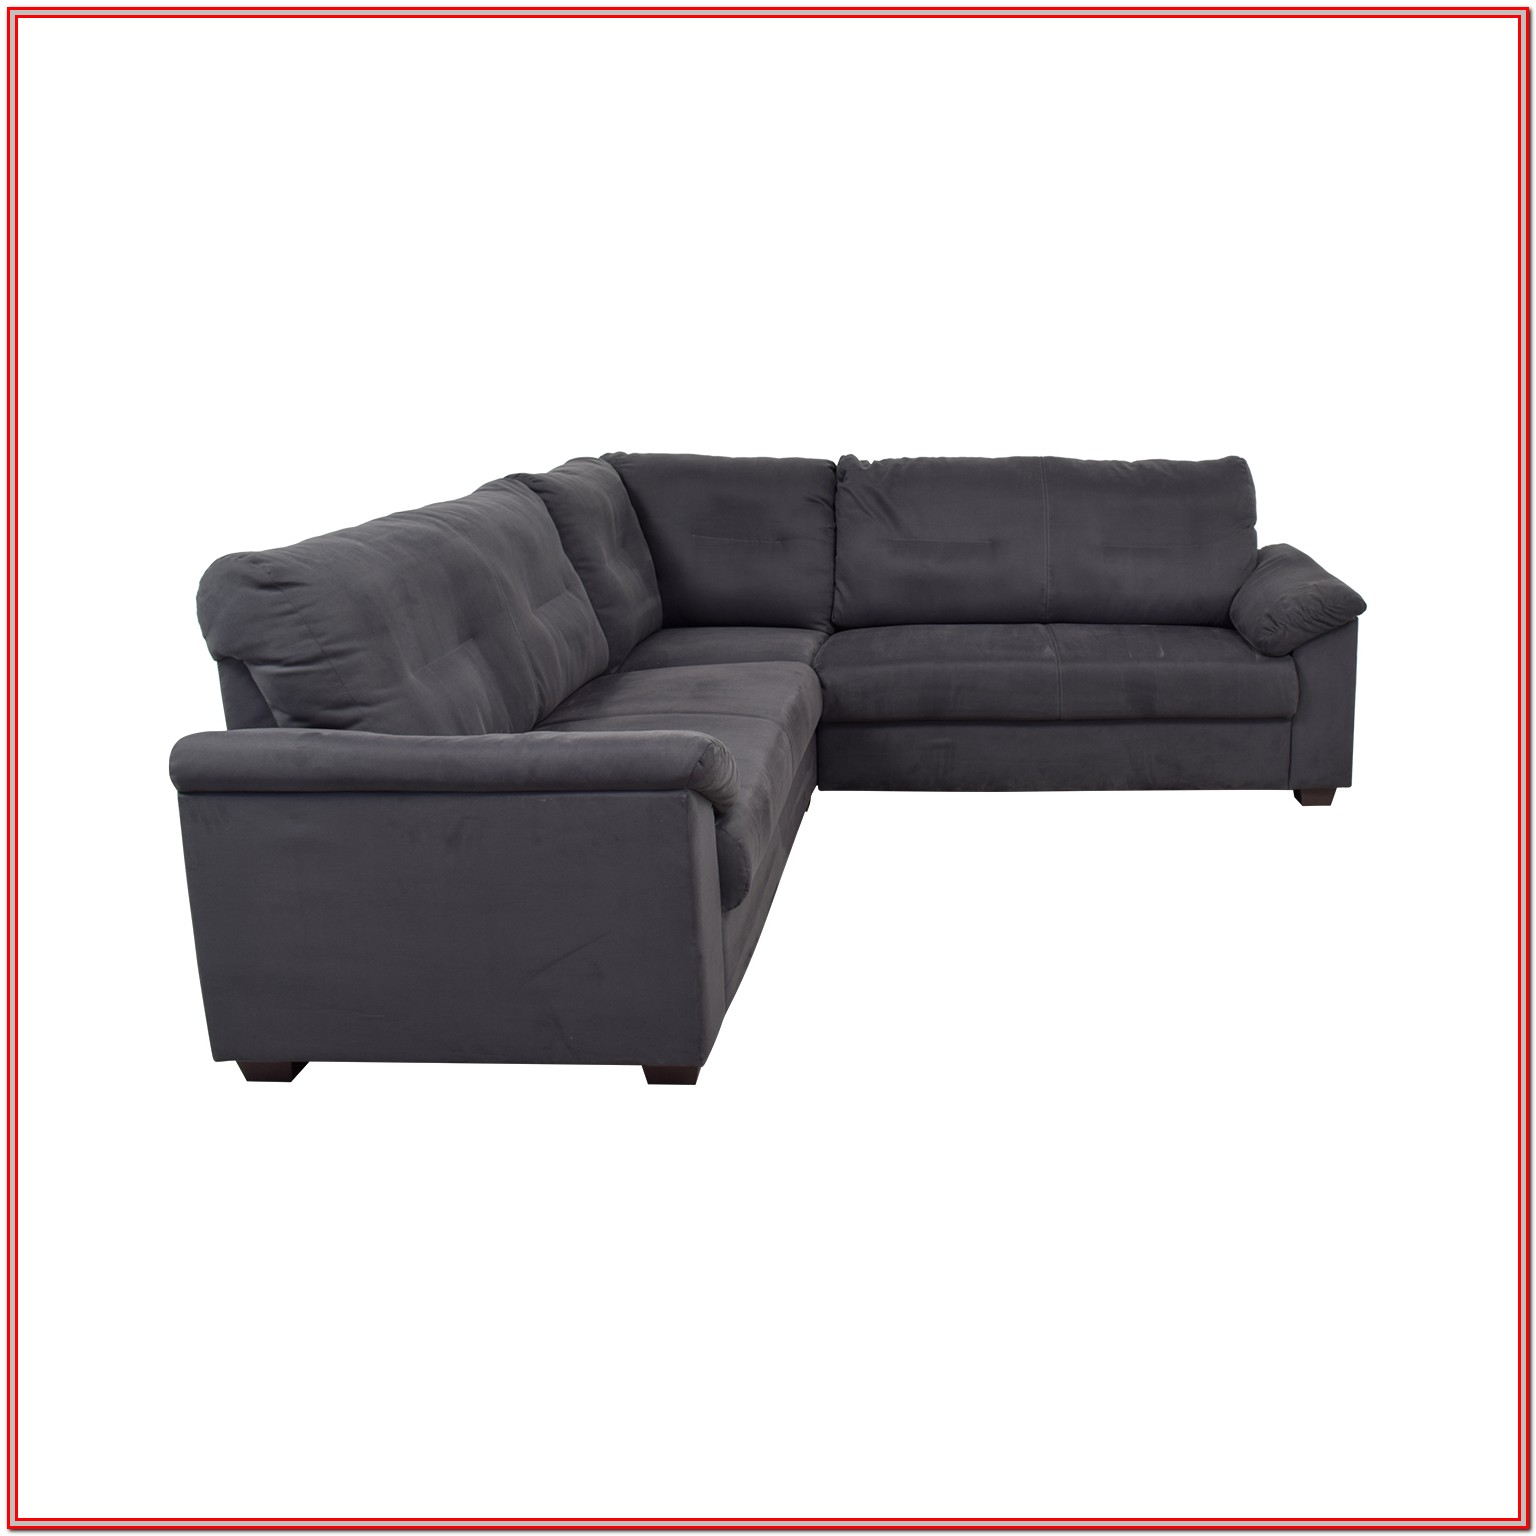 Grey L Shaped Sofa Bed Ikea